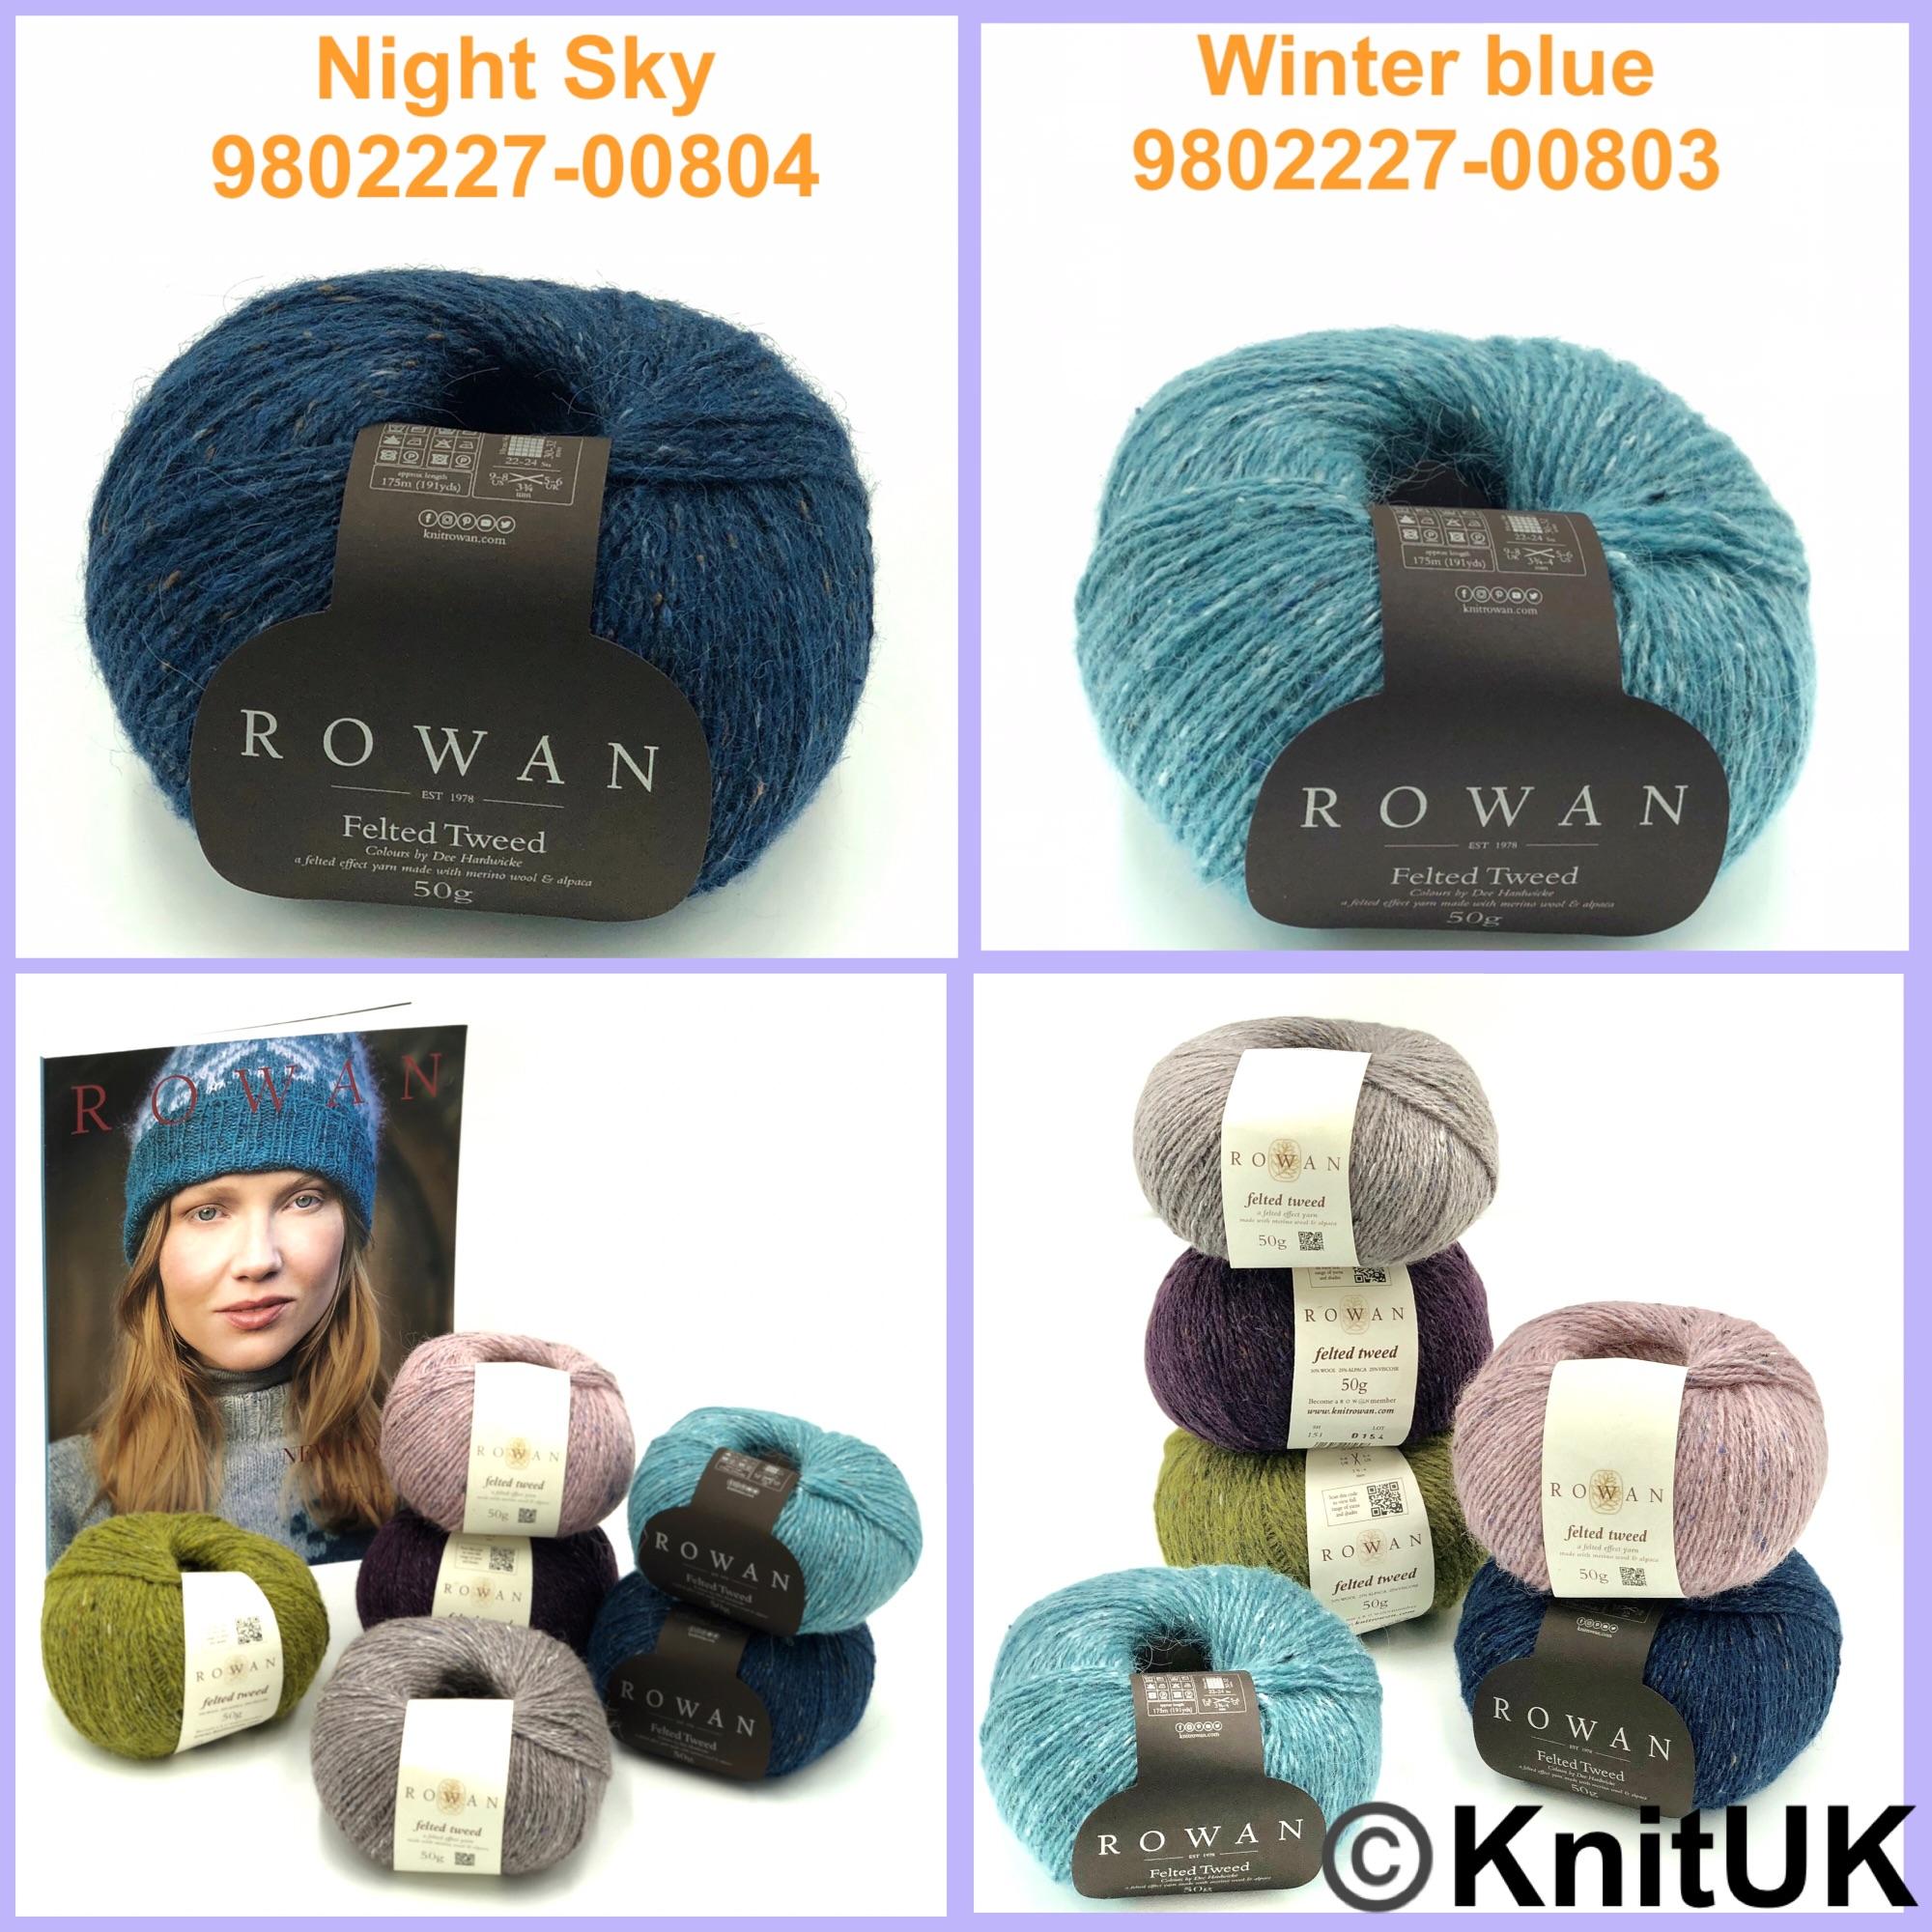 Rowan felted tweed night sky winter blue new nordic knitting yarn